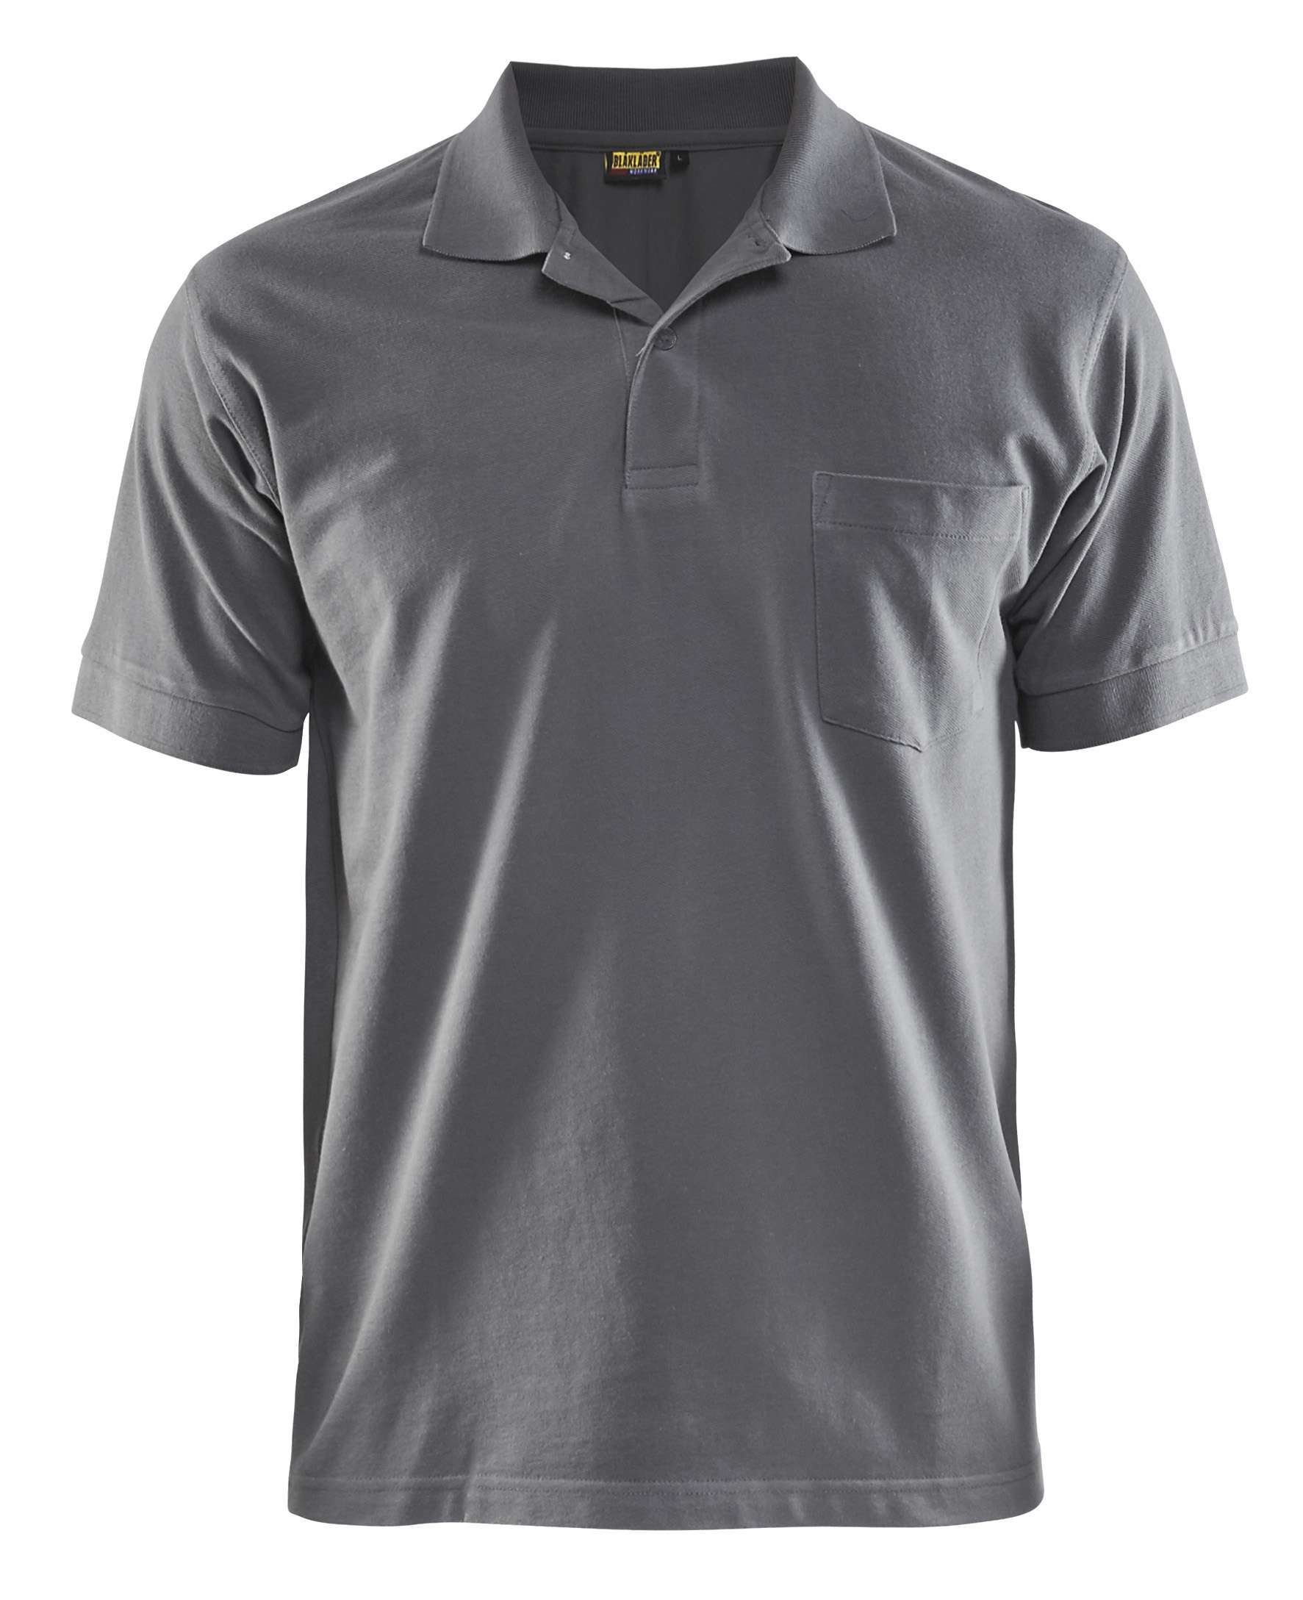 Blaklader Polo shirts 33051035 grijs(9400)